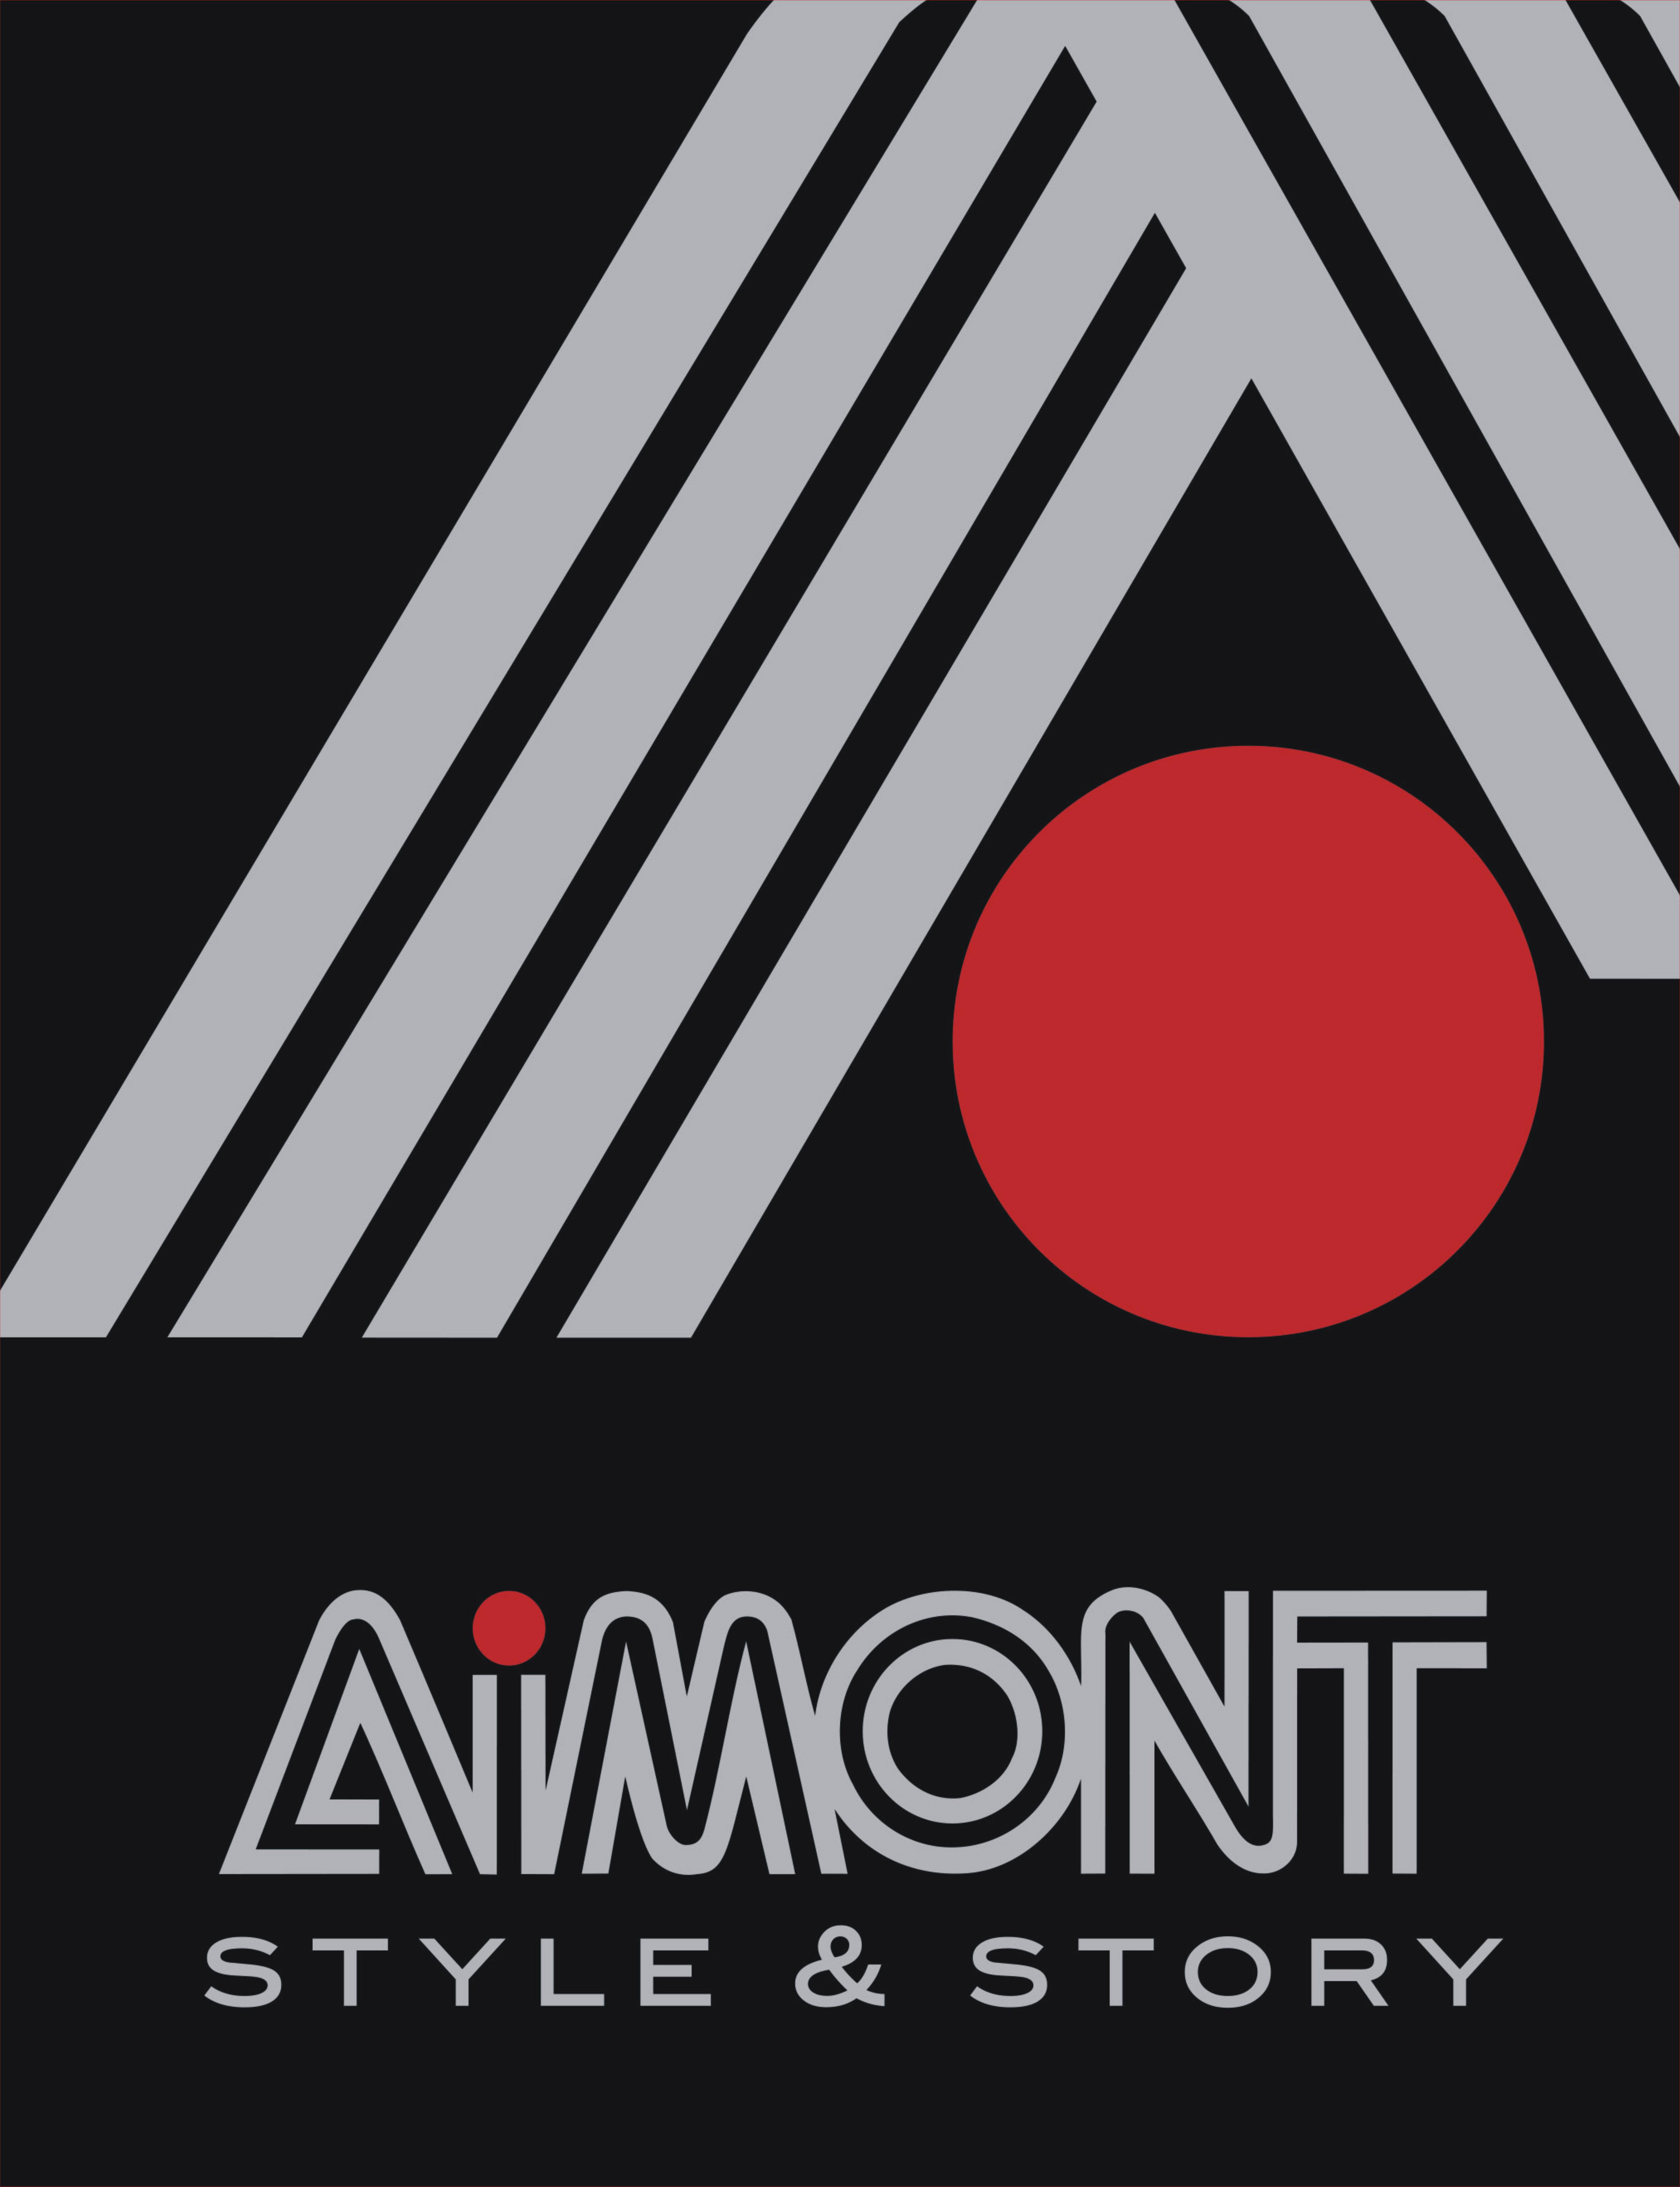 Calzature Aimont